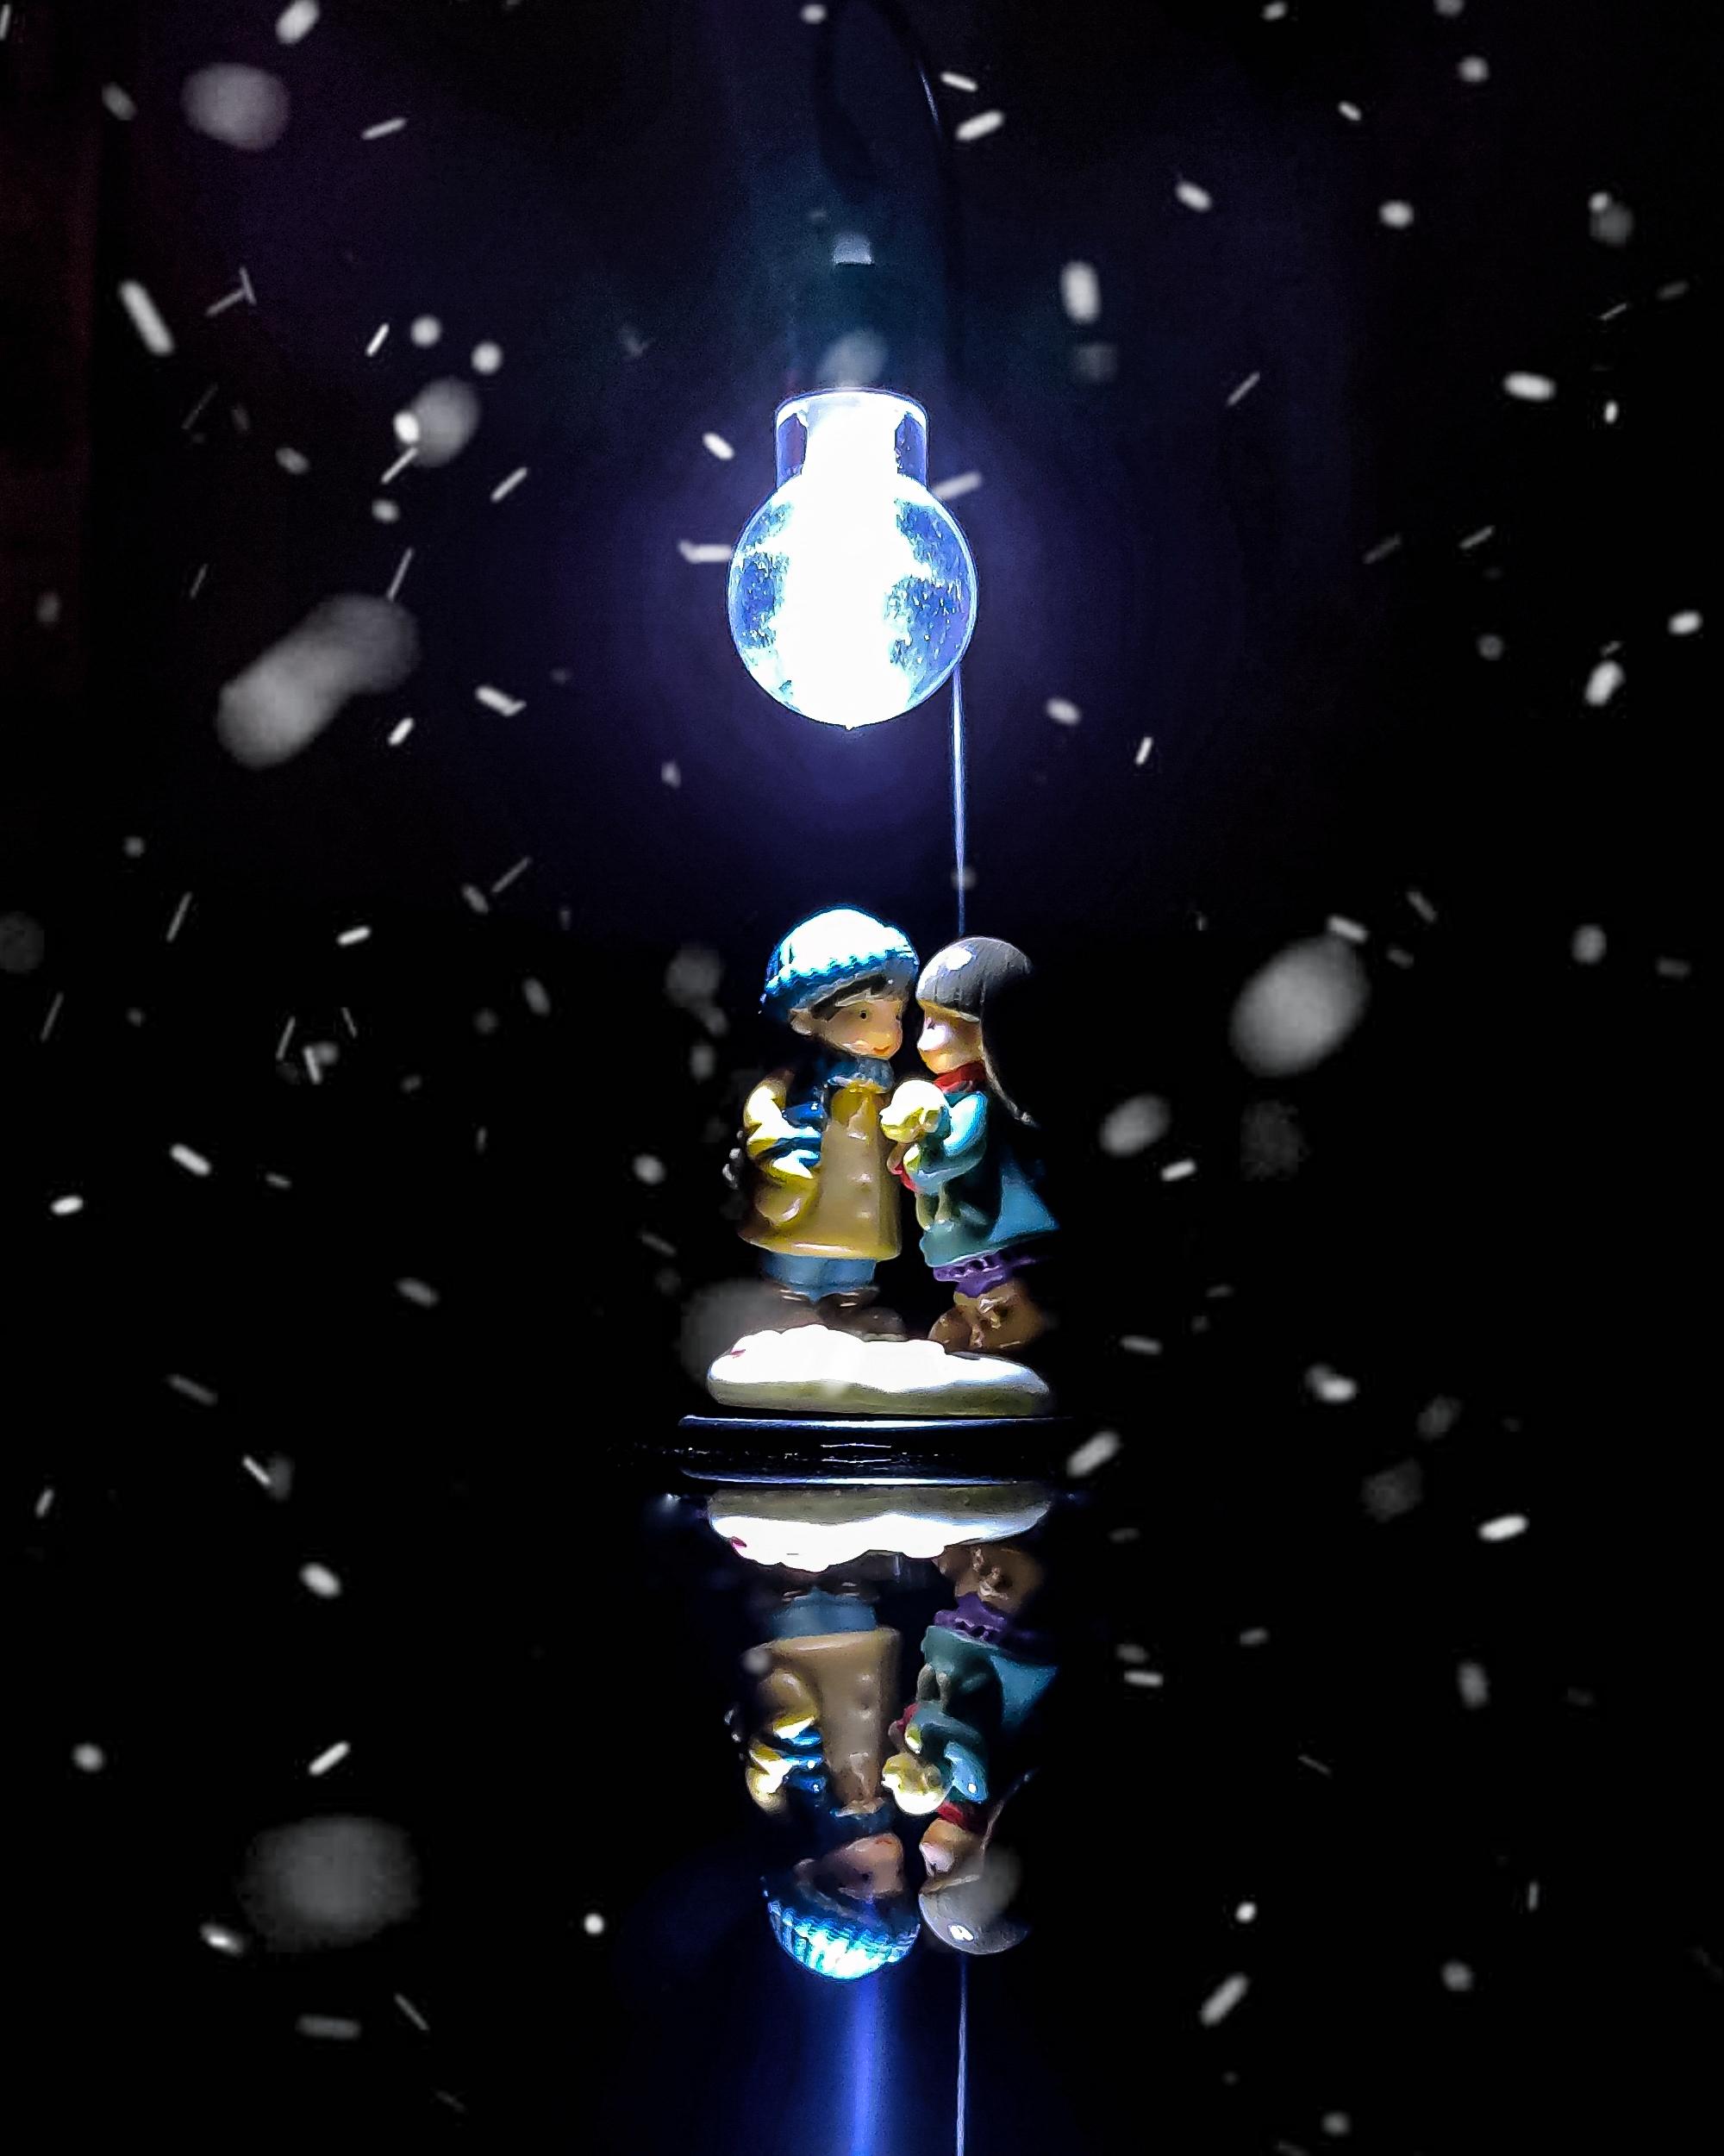 Couple toy under light bulb